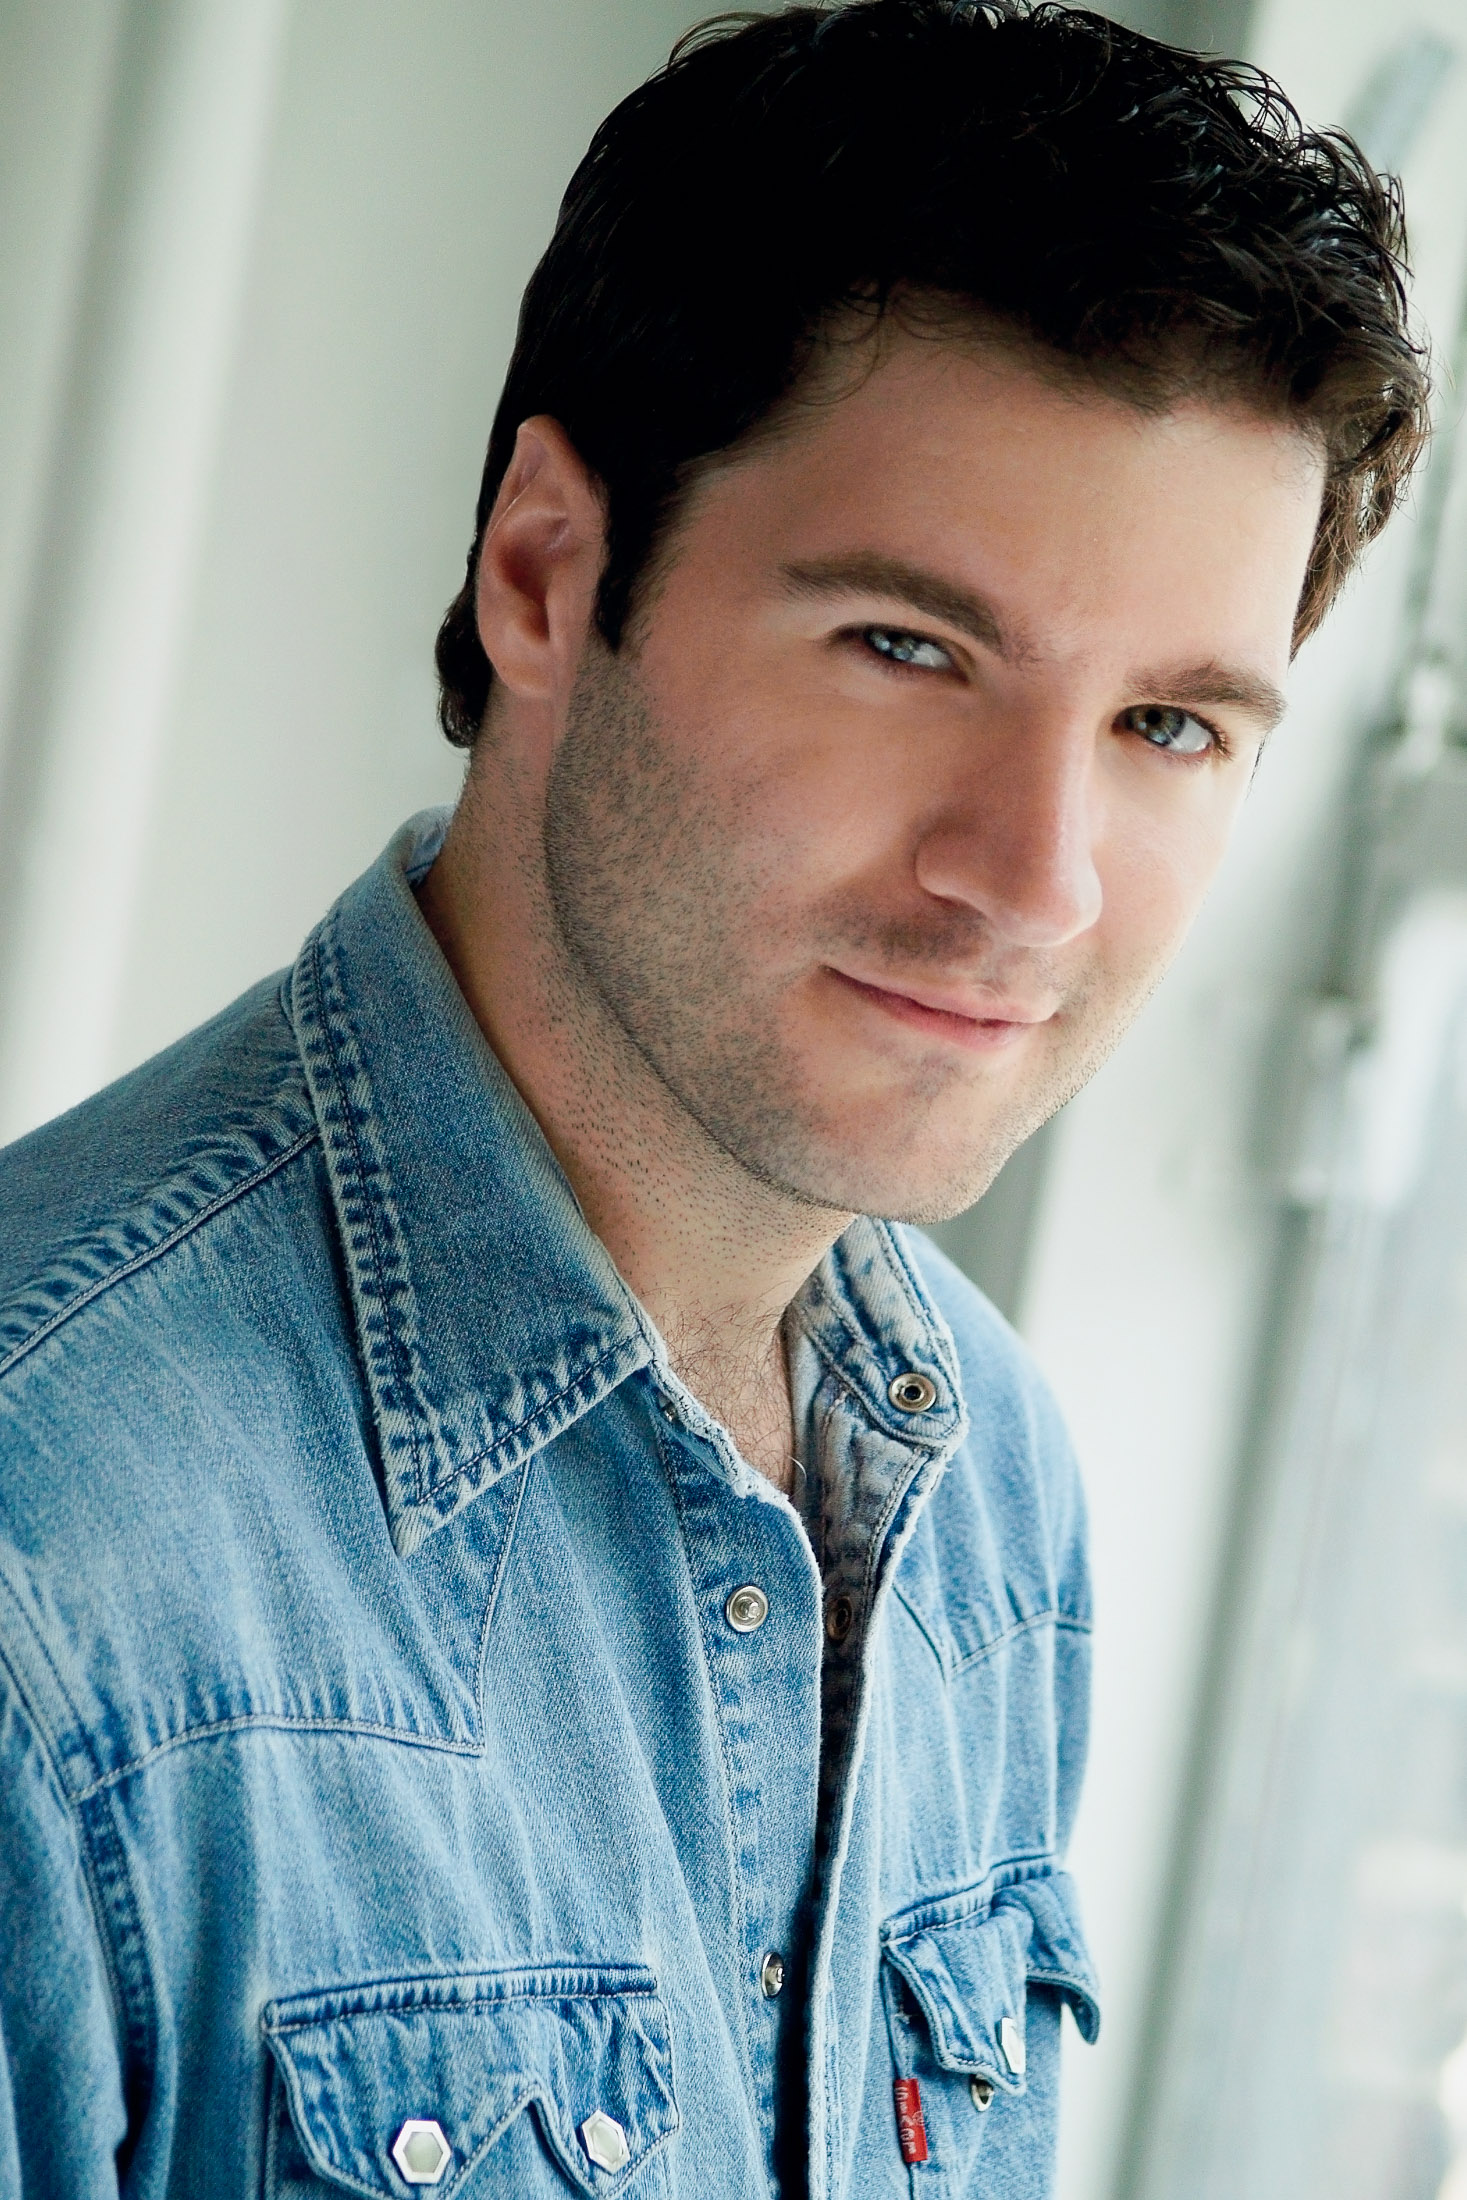 Headshots NYC - Actor Headshots Matt D